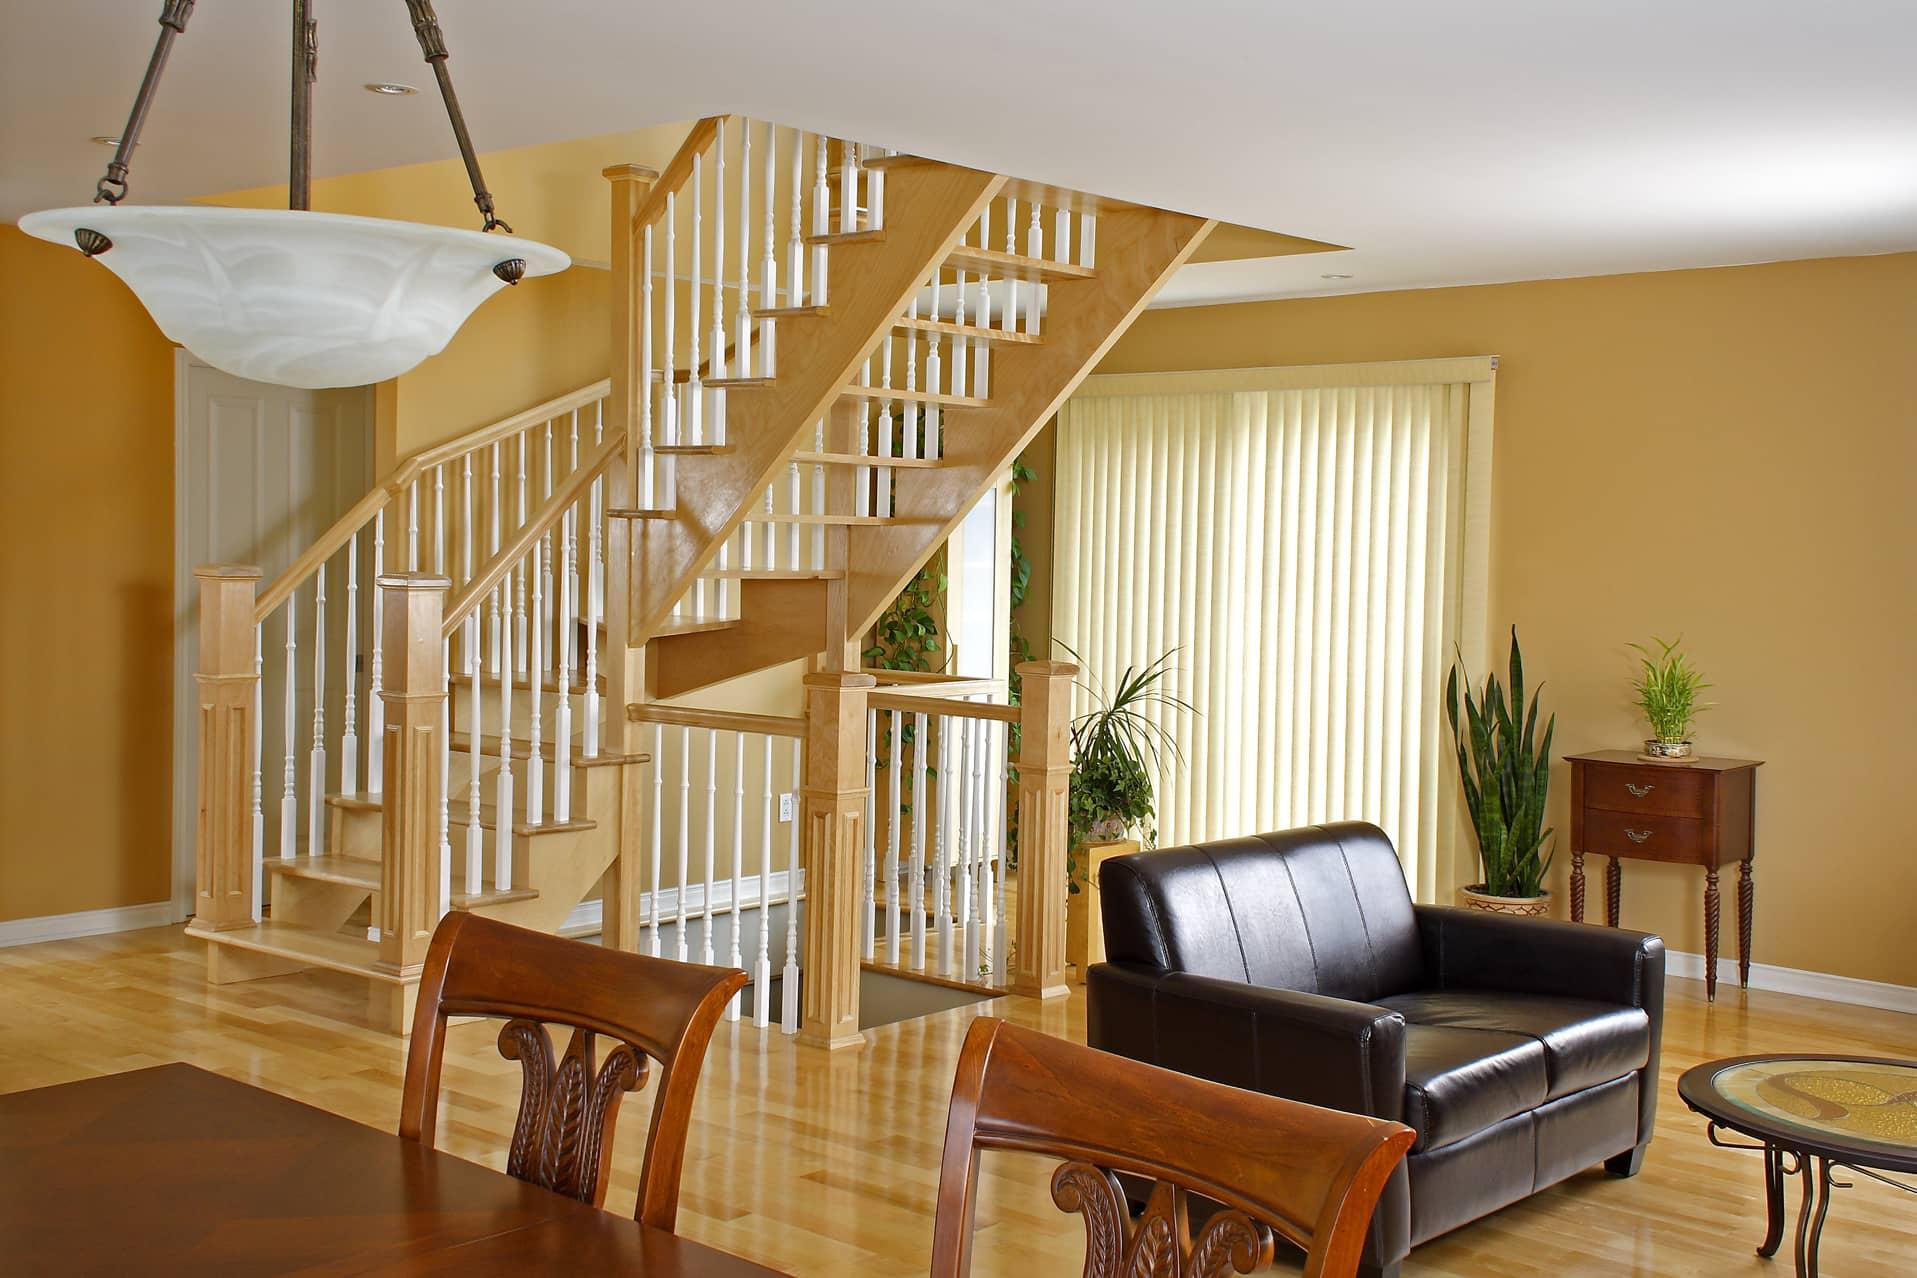 maison montral max larocque with escalier azam. Black Bedroom Furniture Sets. Home Design Ideas